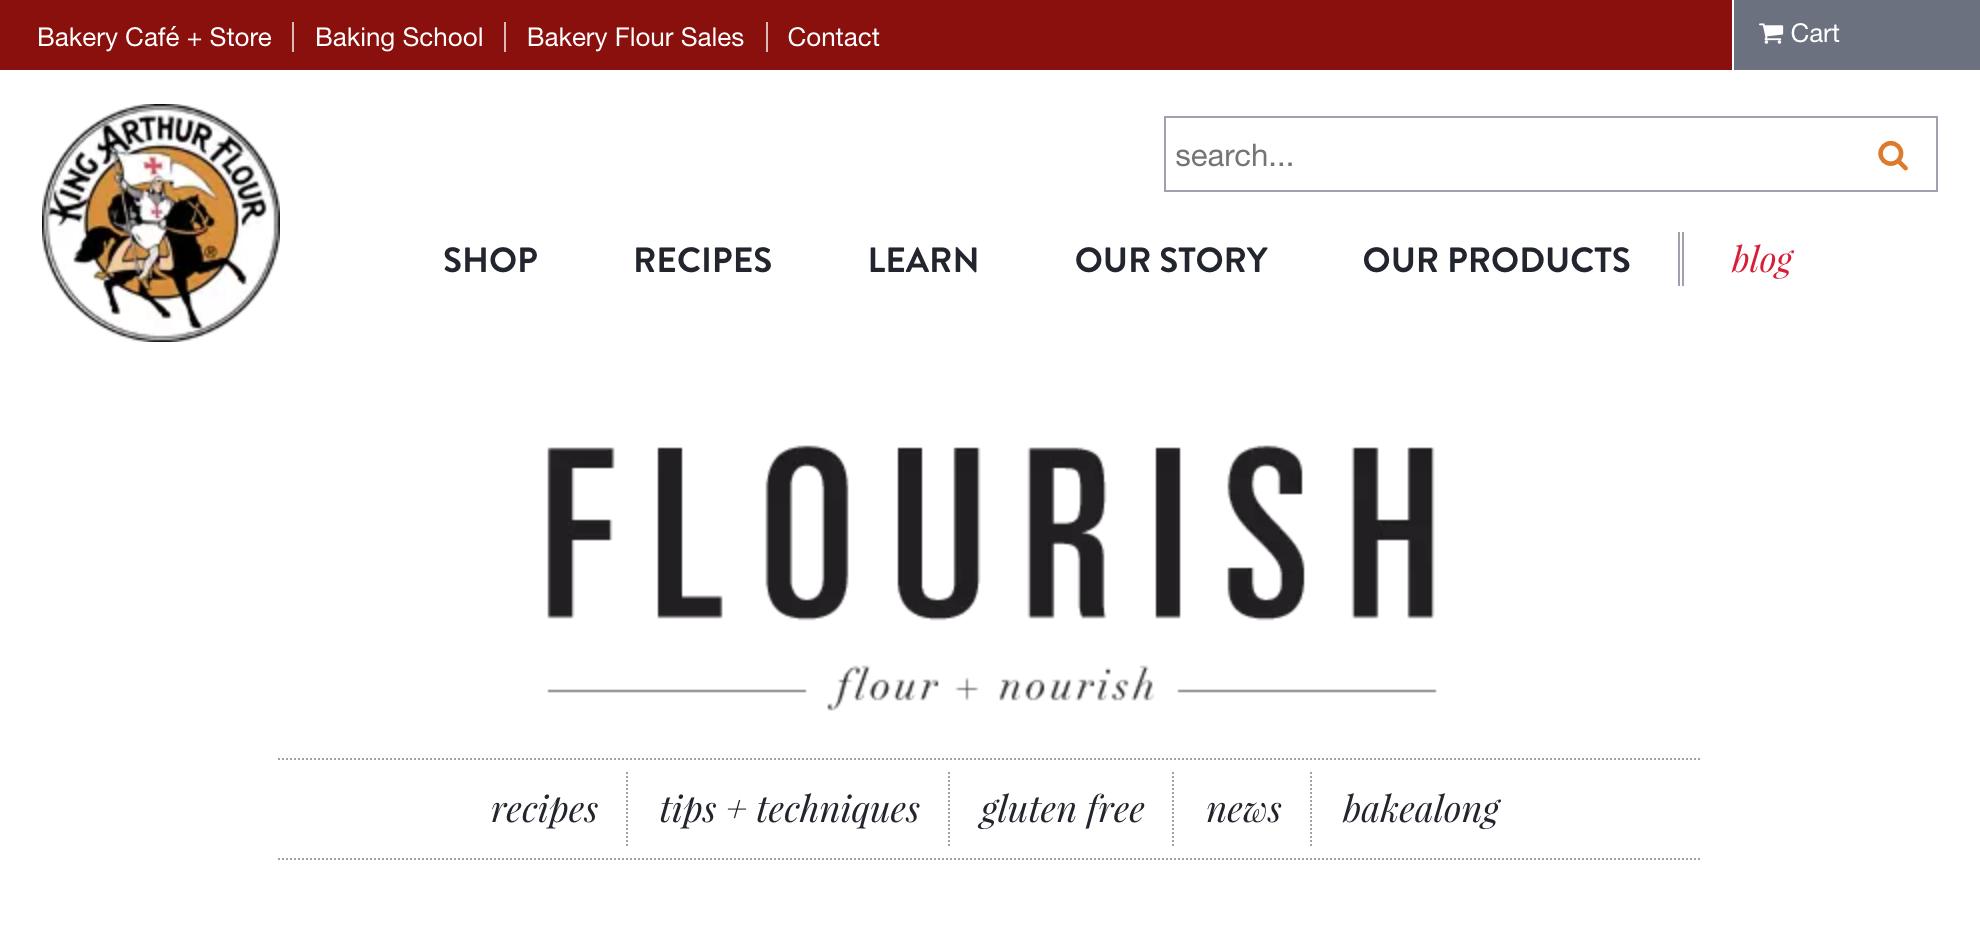 flourish-king-arthur-flour-blog